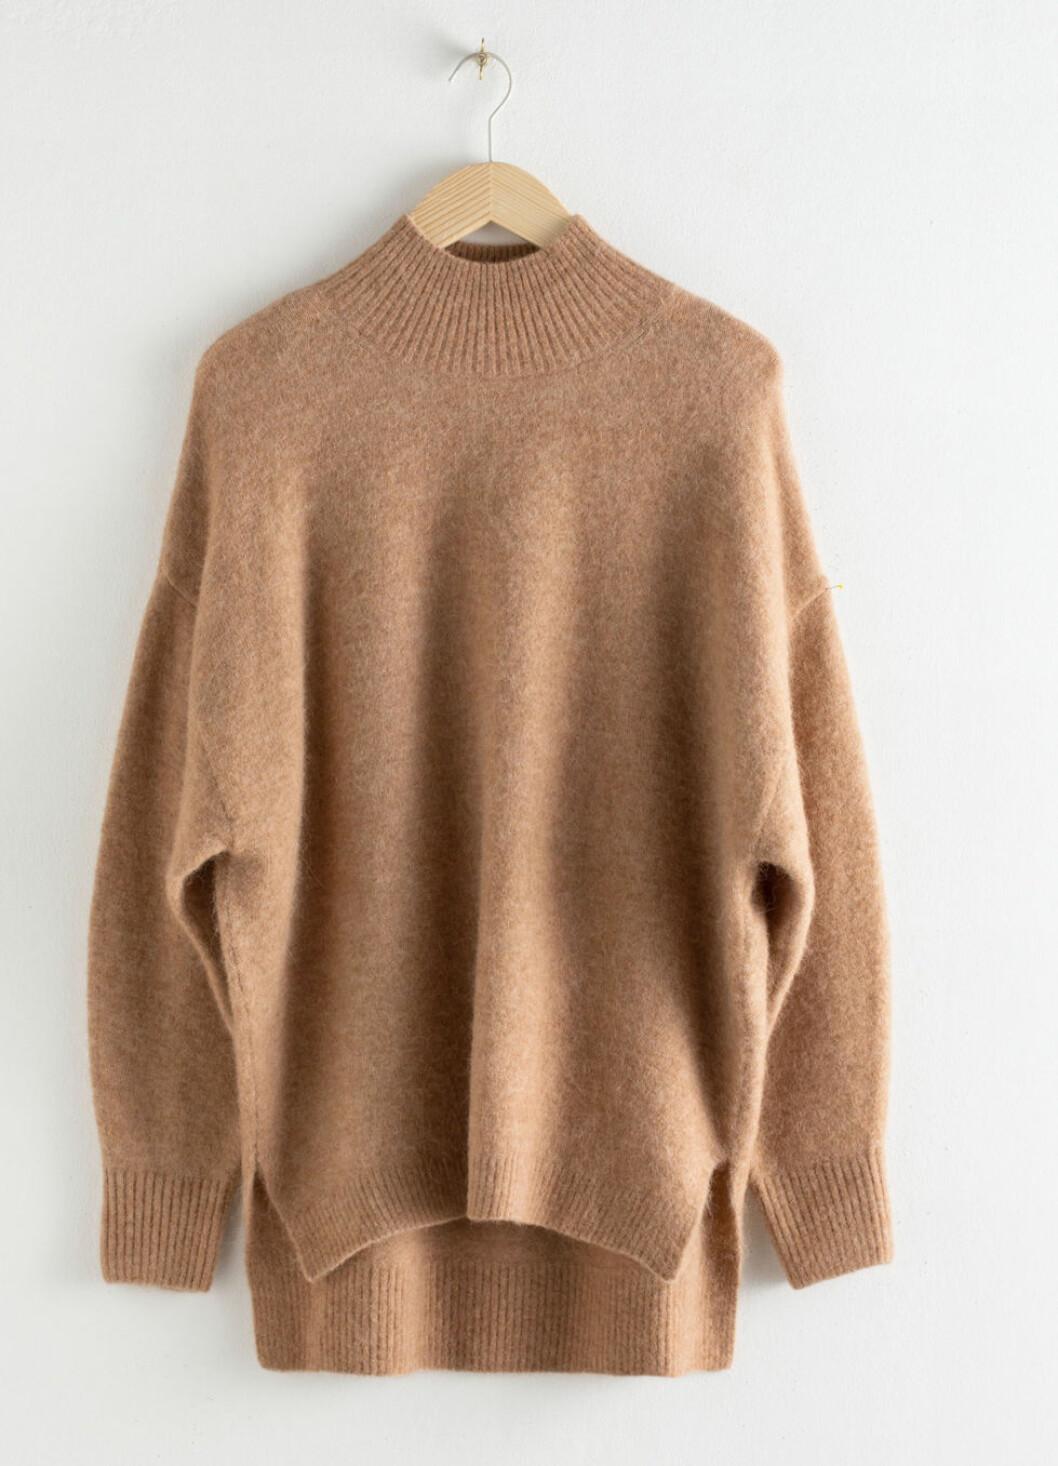 Beige stickad tröja från &other stories